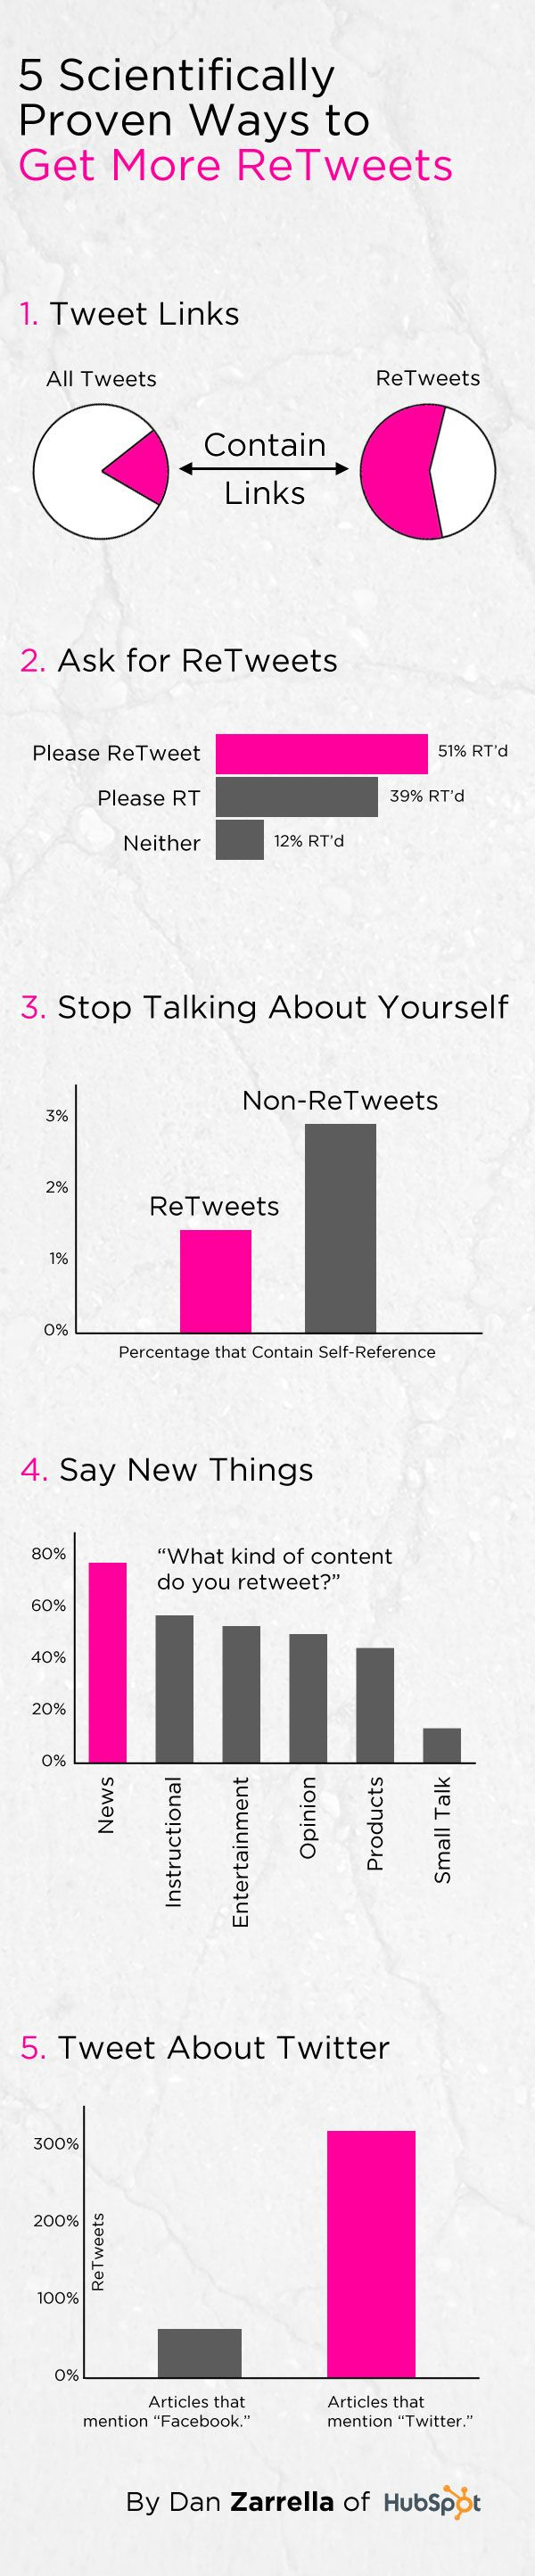 5 Scientifically Proven Ways to Get More ReTweets Internet Site,  Website, Scientific Proven, Web Site, Social Media, Infographic Twitter, Retweet Infographic, Más Retweet, Socialmedia